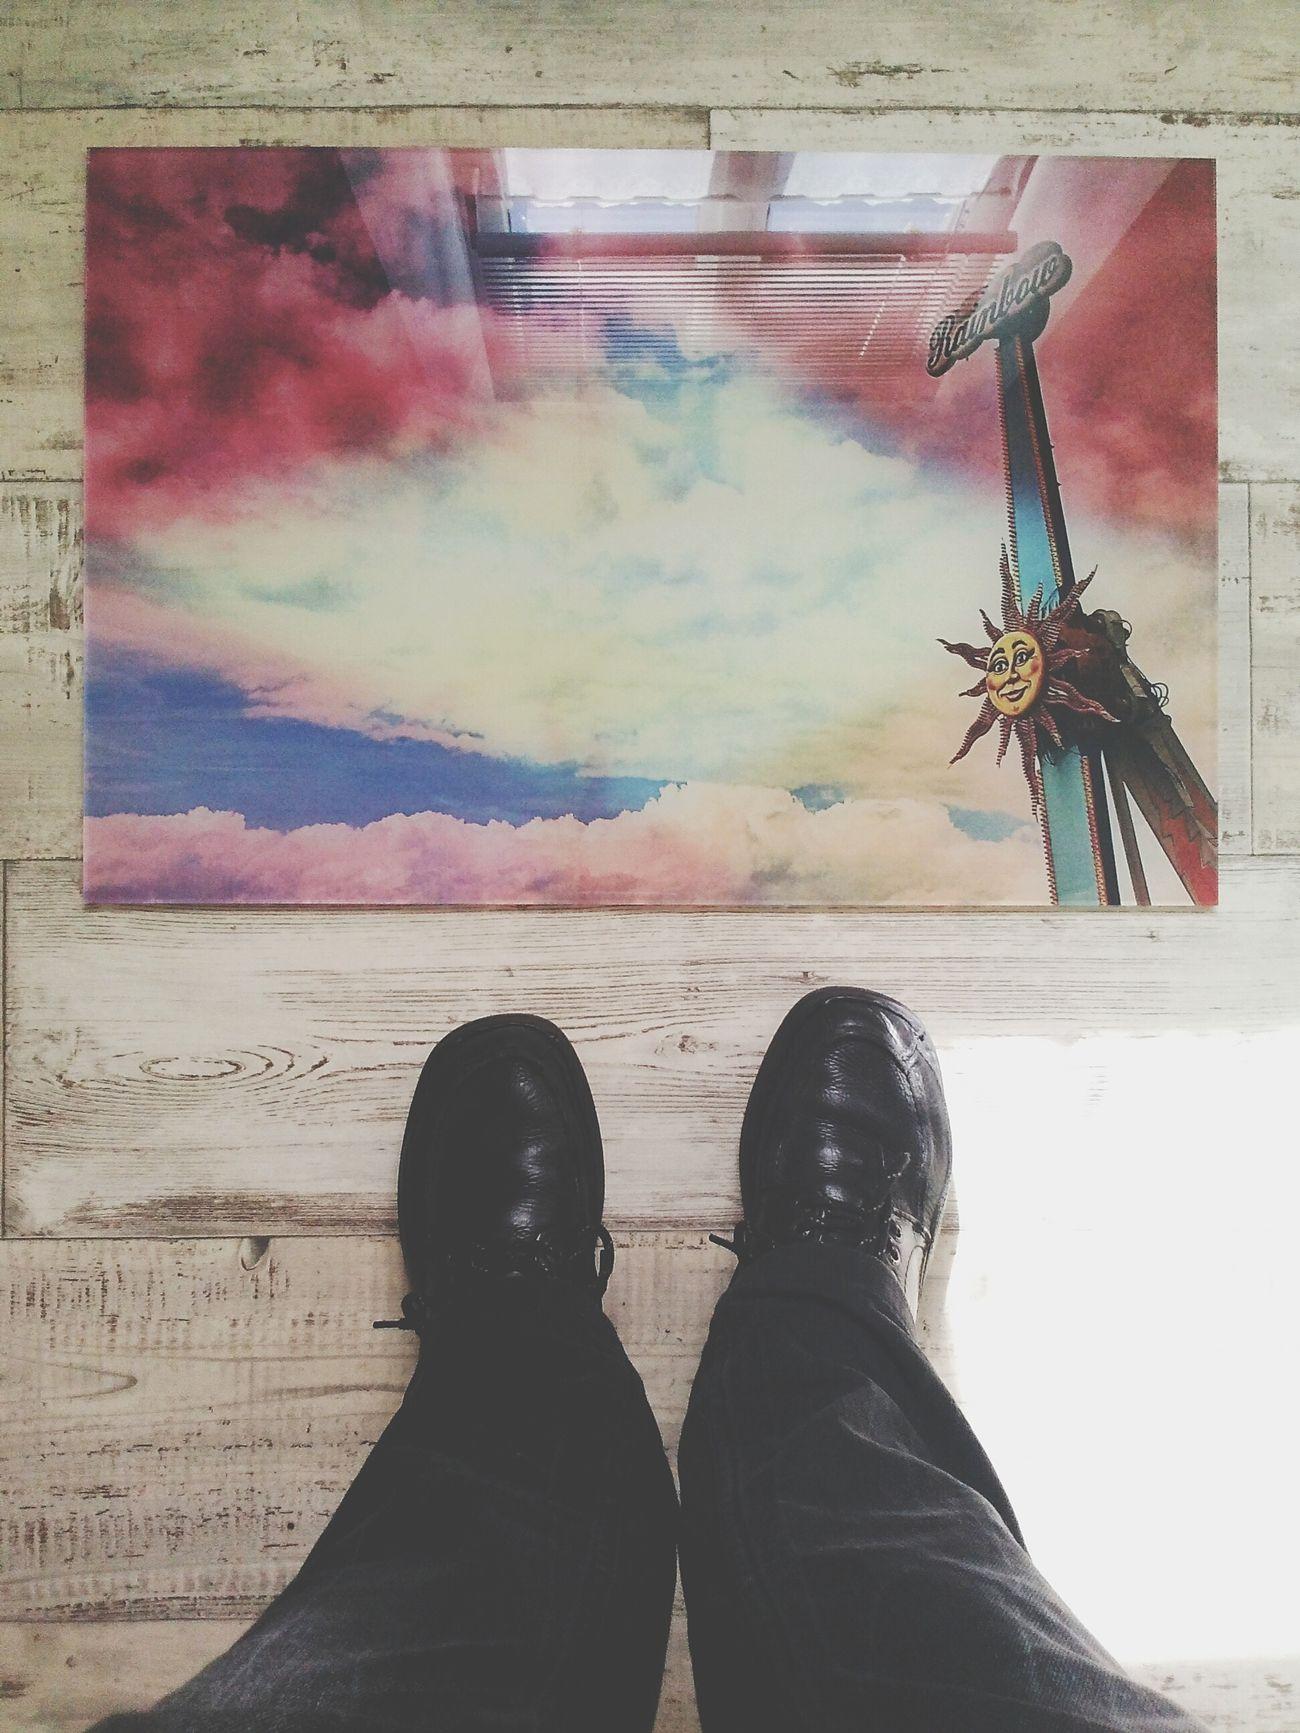 MYArtwork❤ EyeEm The Week Of Eyeem Ahoi Urban Exploration Tadaa Community Hello World EyeEm Team EyeEm Masterclass Leer (Ostfriesland) Myhometown The Week On Eyem EyeEm Gallery Openyourmind Have A Nice Day♥ Check This Out EyeEm Best Edits Ihaveadream Eyeemlove Streetart